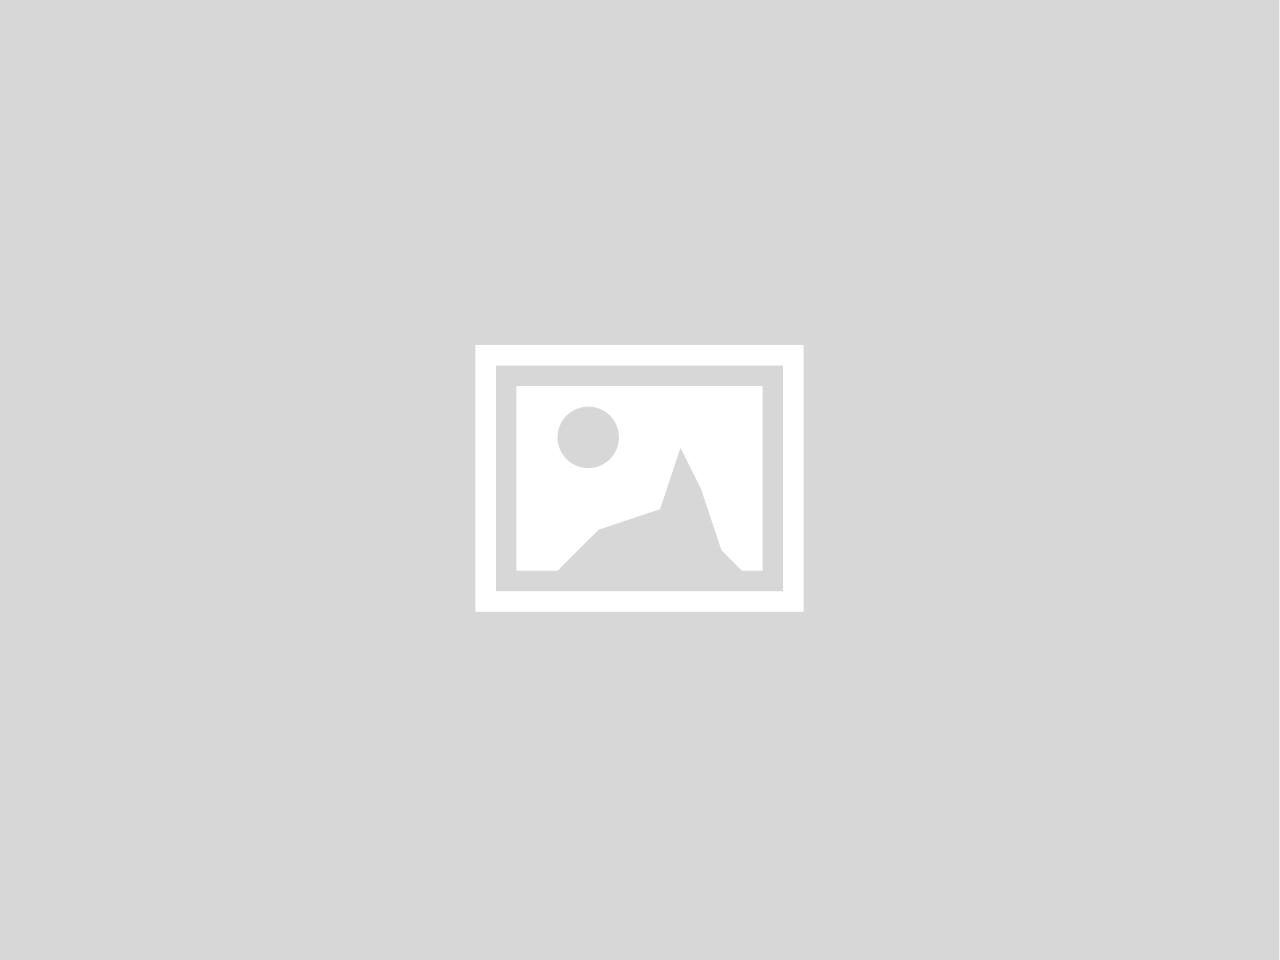 Karlstadt feiert 1:0 Heimsieg